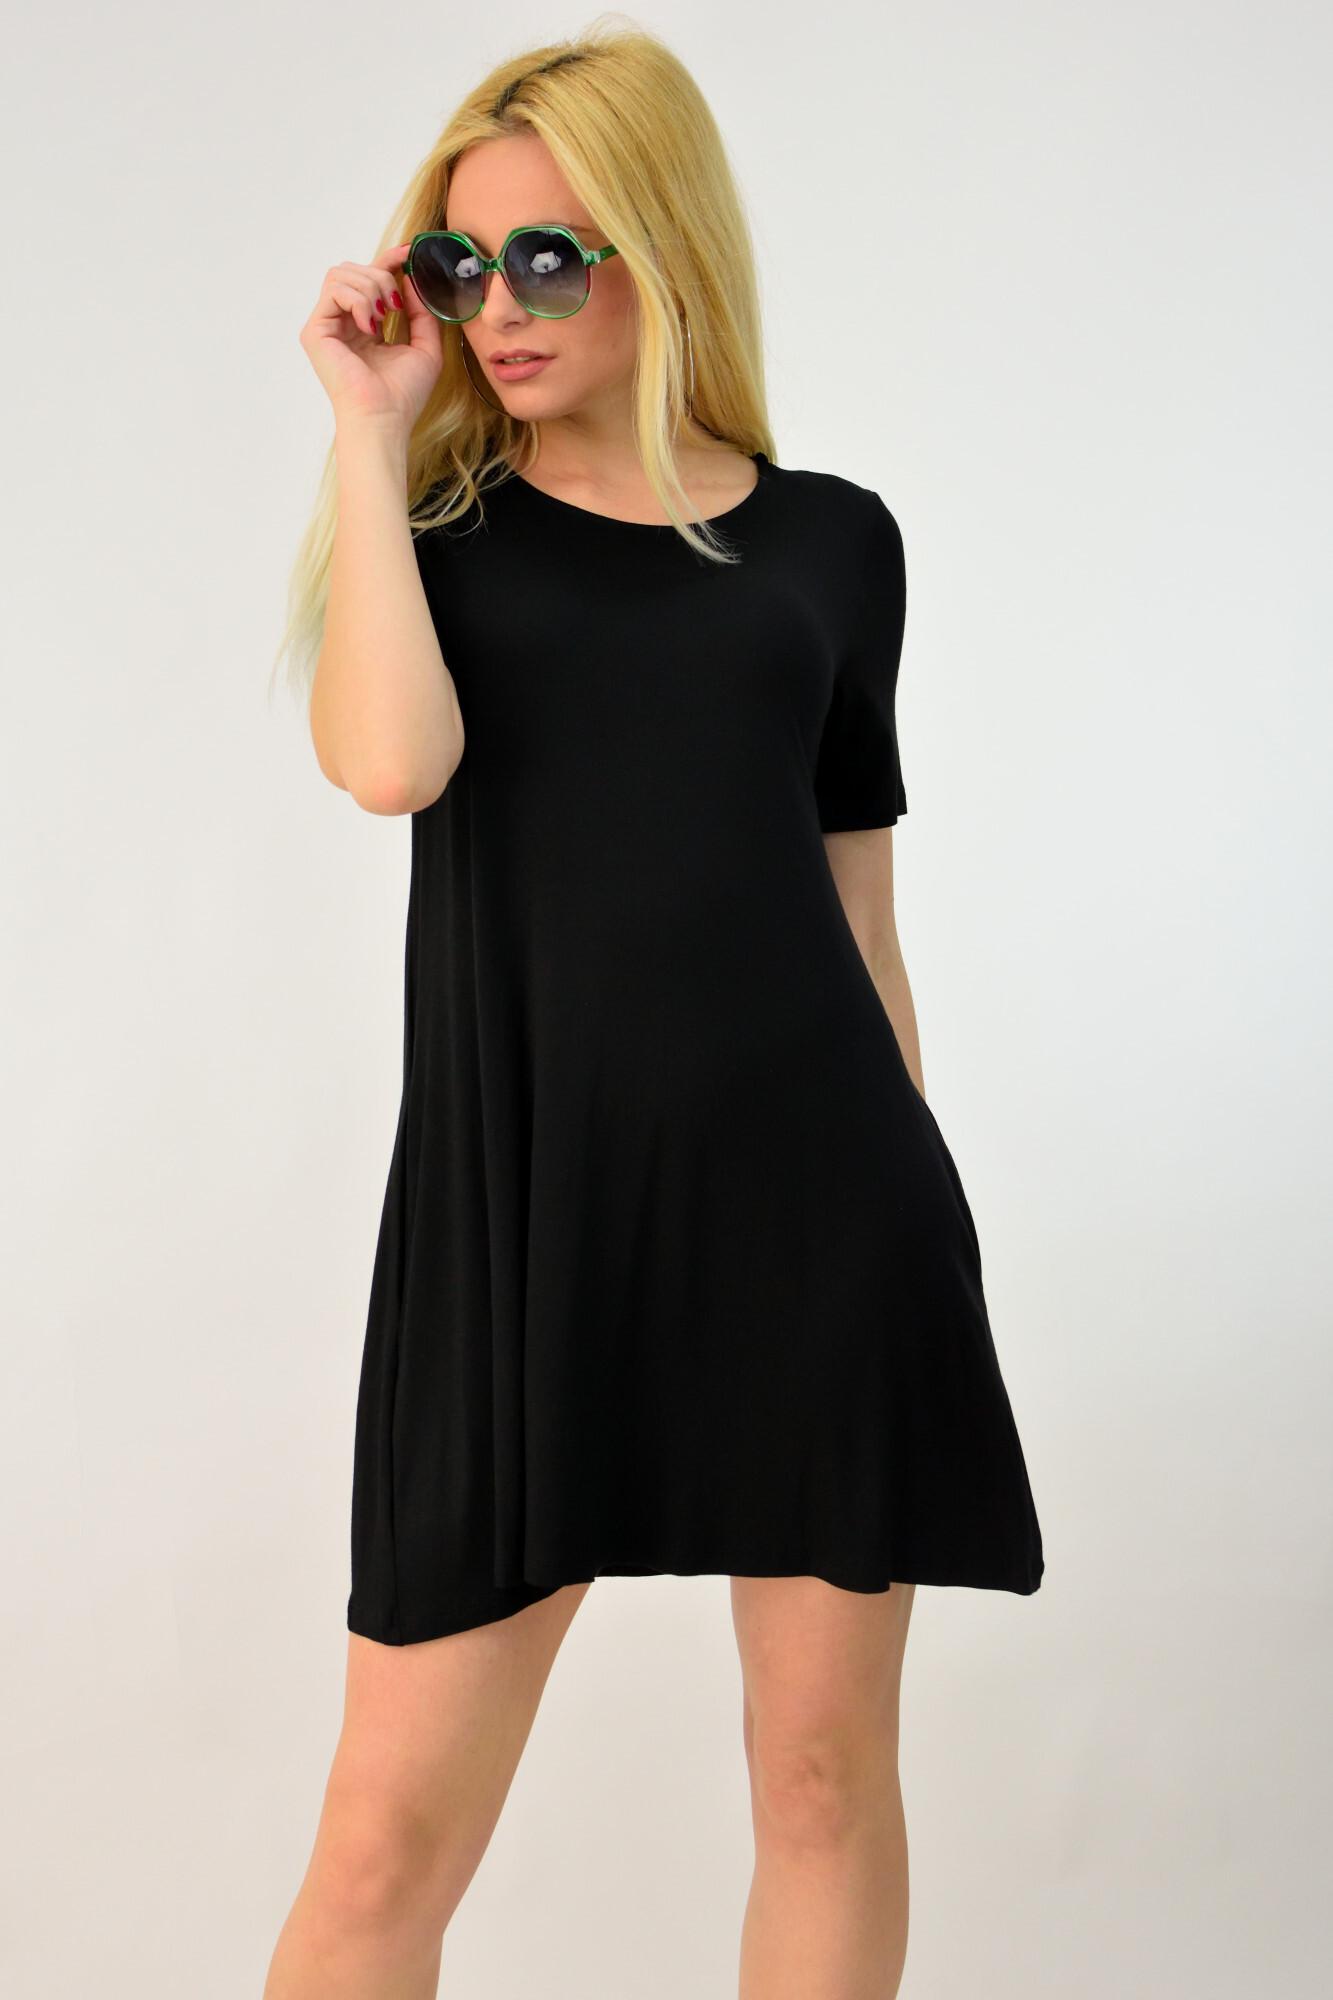 70177c7ac15b ΚΟΝΤΑ ΦΟΡΕΜΑΤΑ ΜΙΝΙ ΚΑΘΗΜΕΡΙΝΟ ΦΟΡΕΜΑ · Μίνι καθημερινό φόρεμα. Tap to  expand